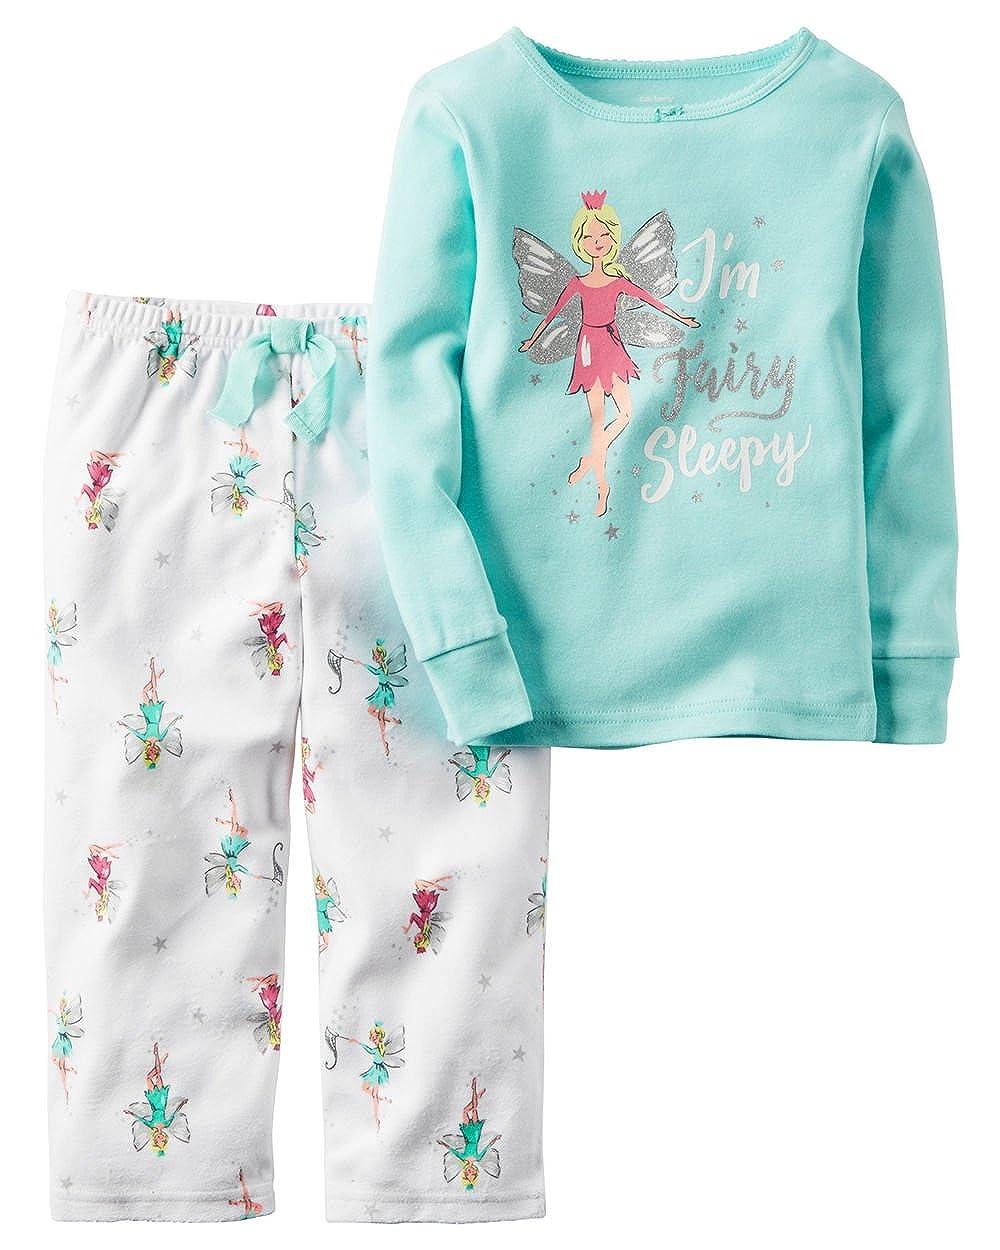 870812d85 Amazon.com  Carter s Girl Striped Owl Henley   Mixed-Print Pants ...